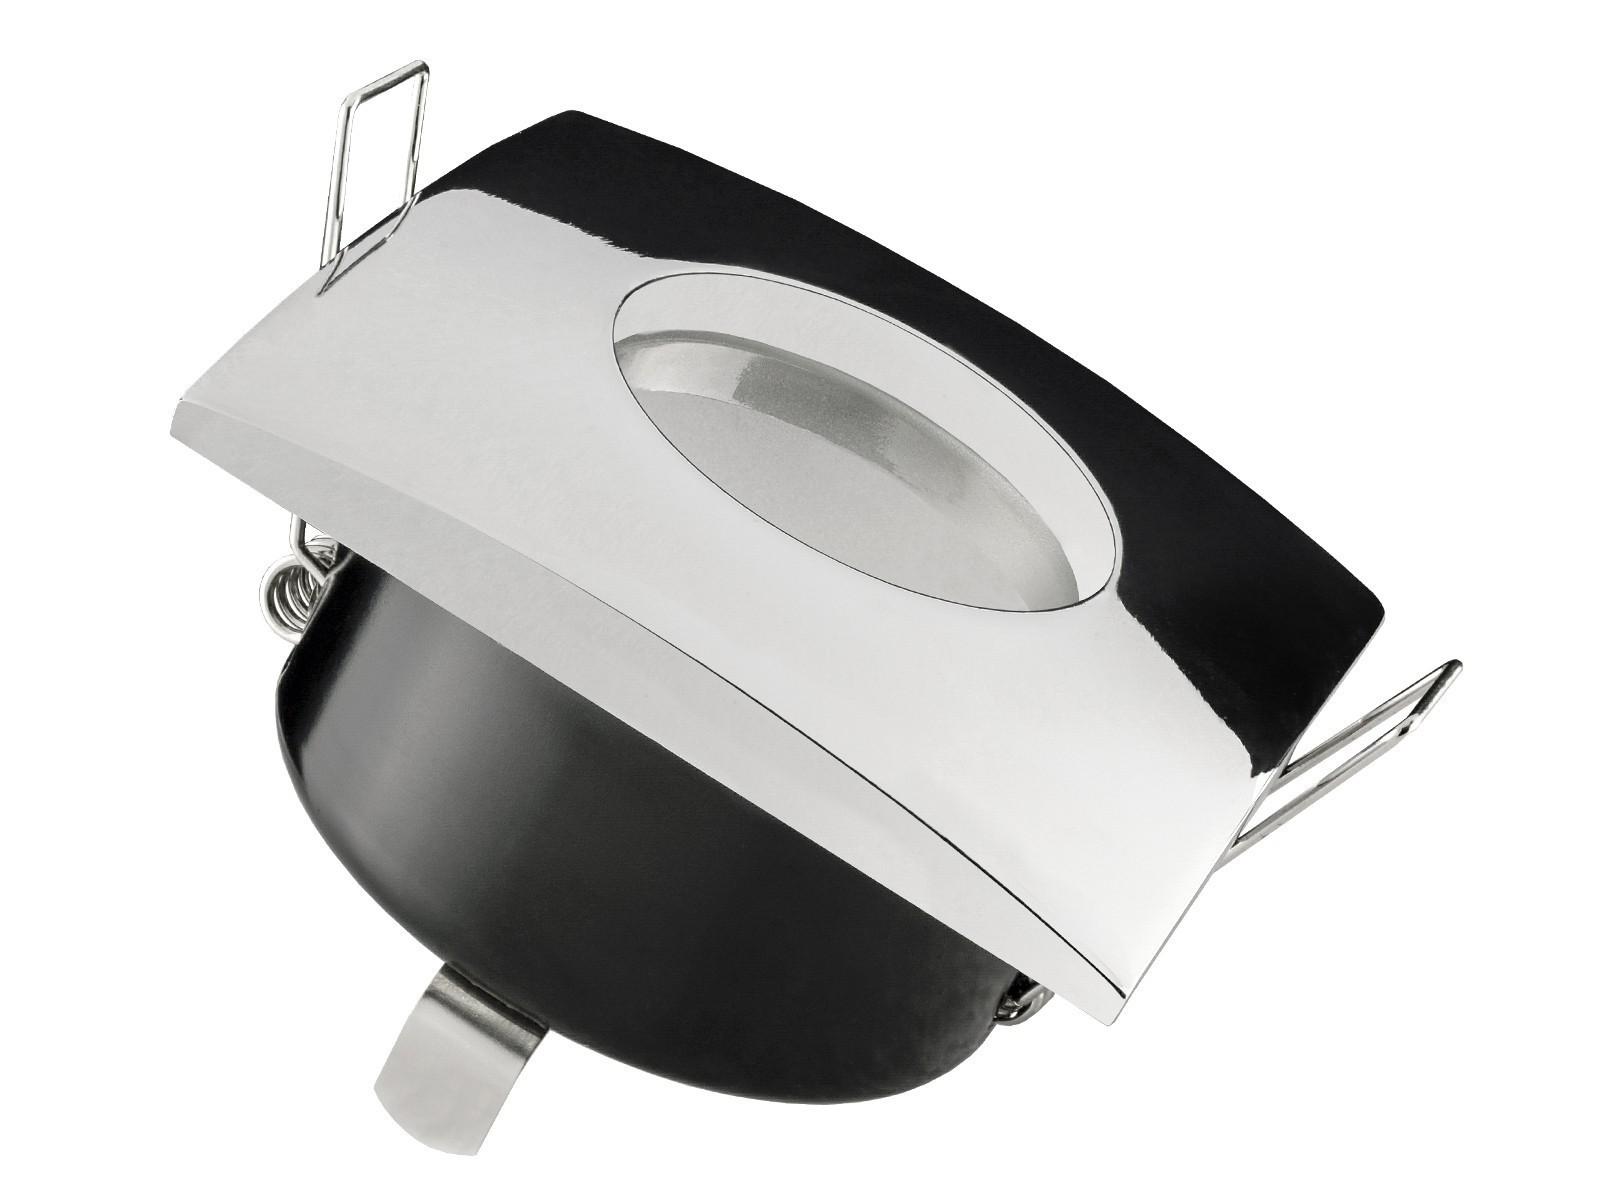 qw 1 feuchtraum led einbaustrahler bad einbauleuchte chrom ip65 5w smd led warm wei gu10. Black Bedroom Furniture Sets. Home Design Ideas